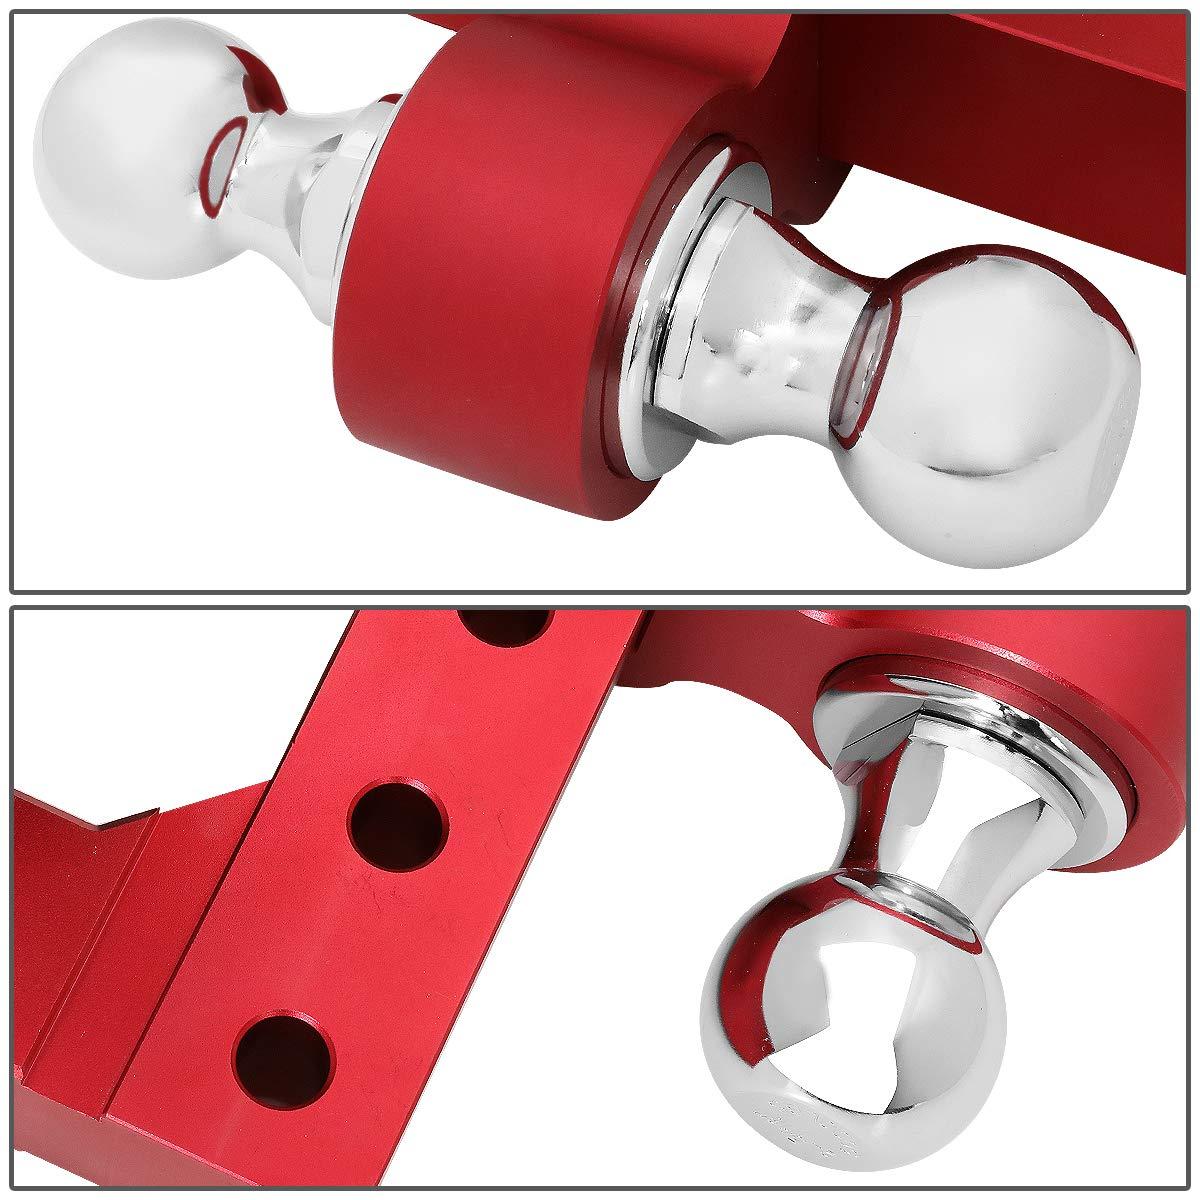 DNA MOTORING HITCH-ALU-001-RD Aluminum 6 Drop Adjustable Dual Ball Trailer Towing Hitch